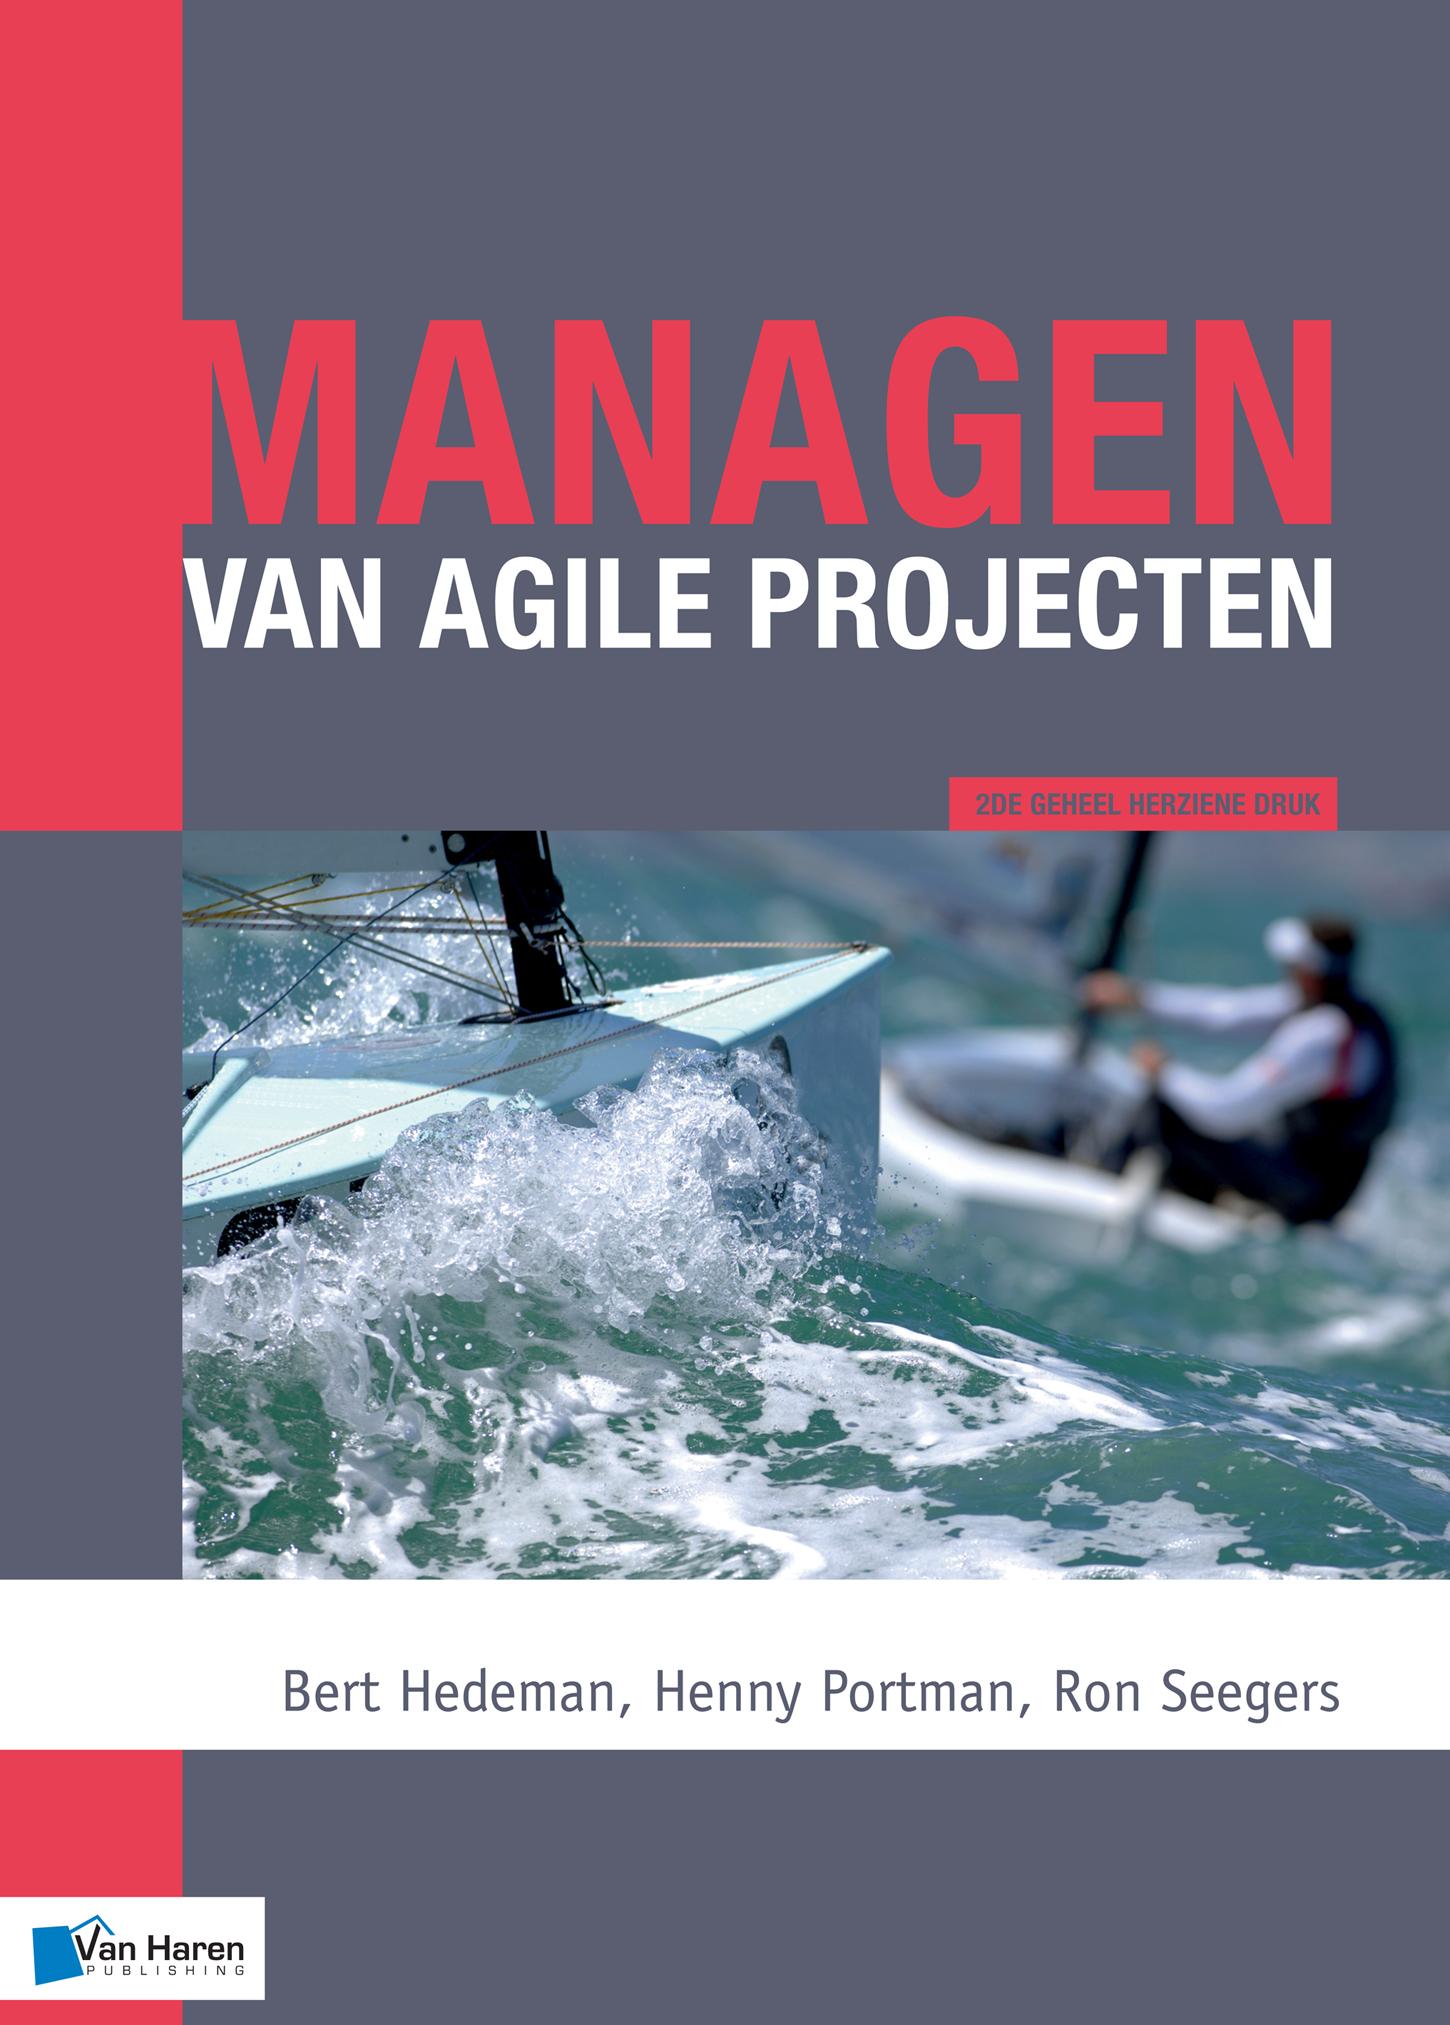 AgilePM - Management van Agile projecten